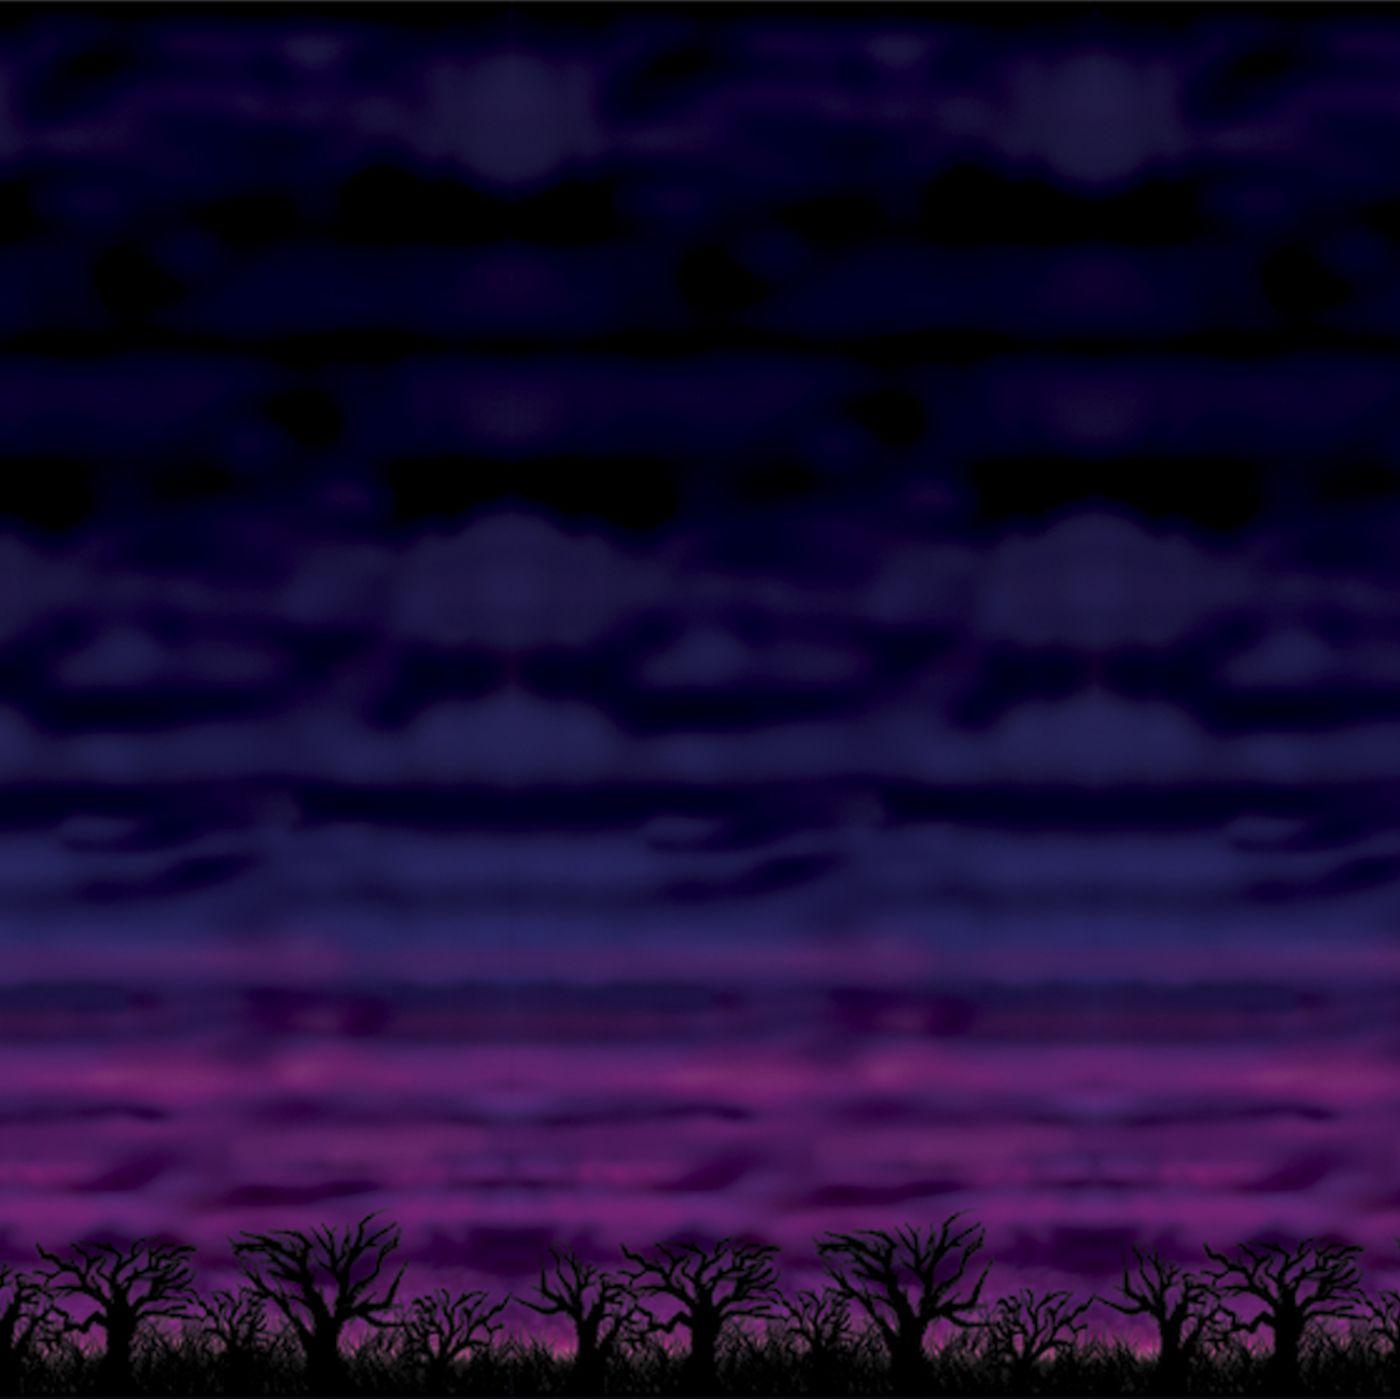 Spooky Sky Backdrop (6) image